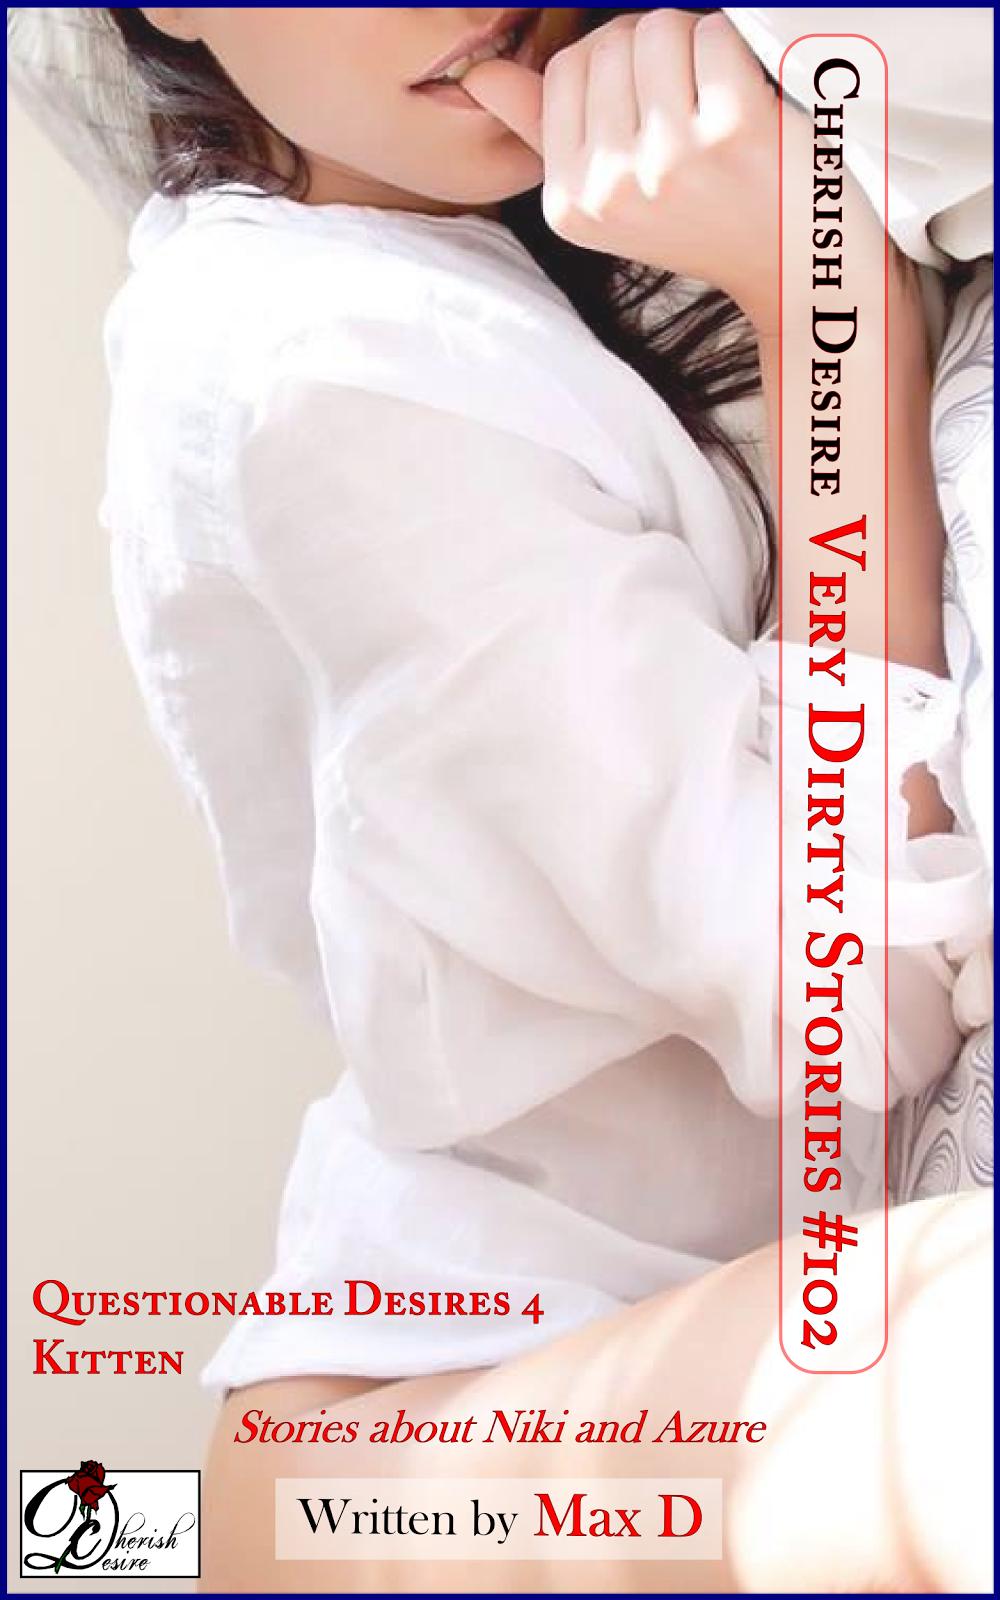 Cherish Desire: Very Dirty Stories #102, Max D, erotica